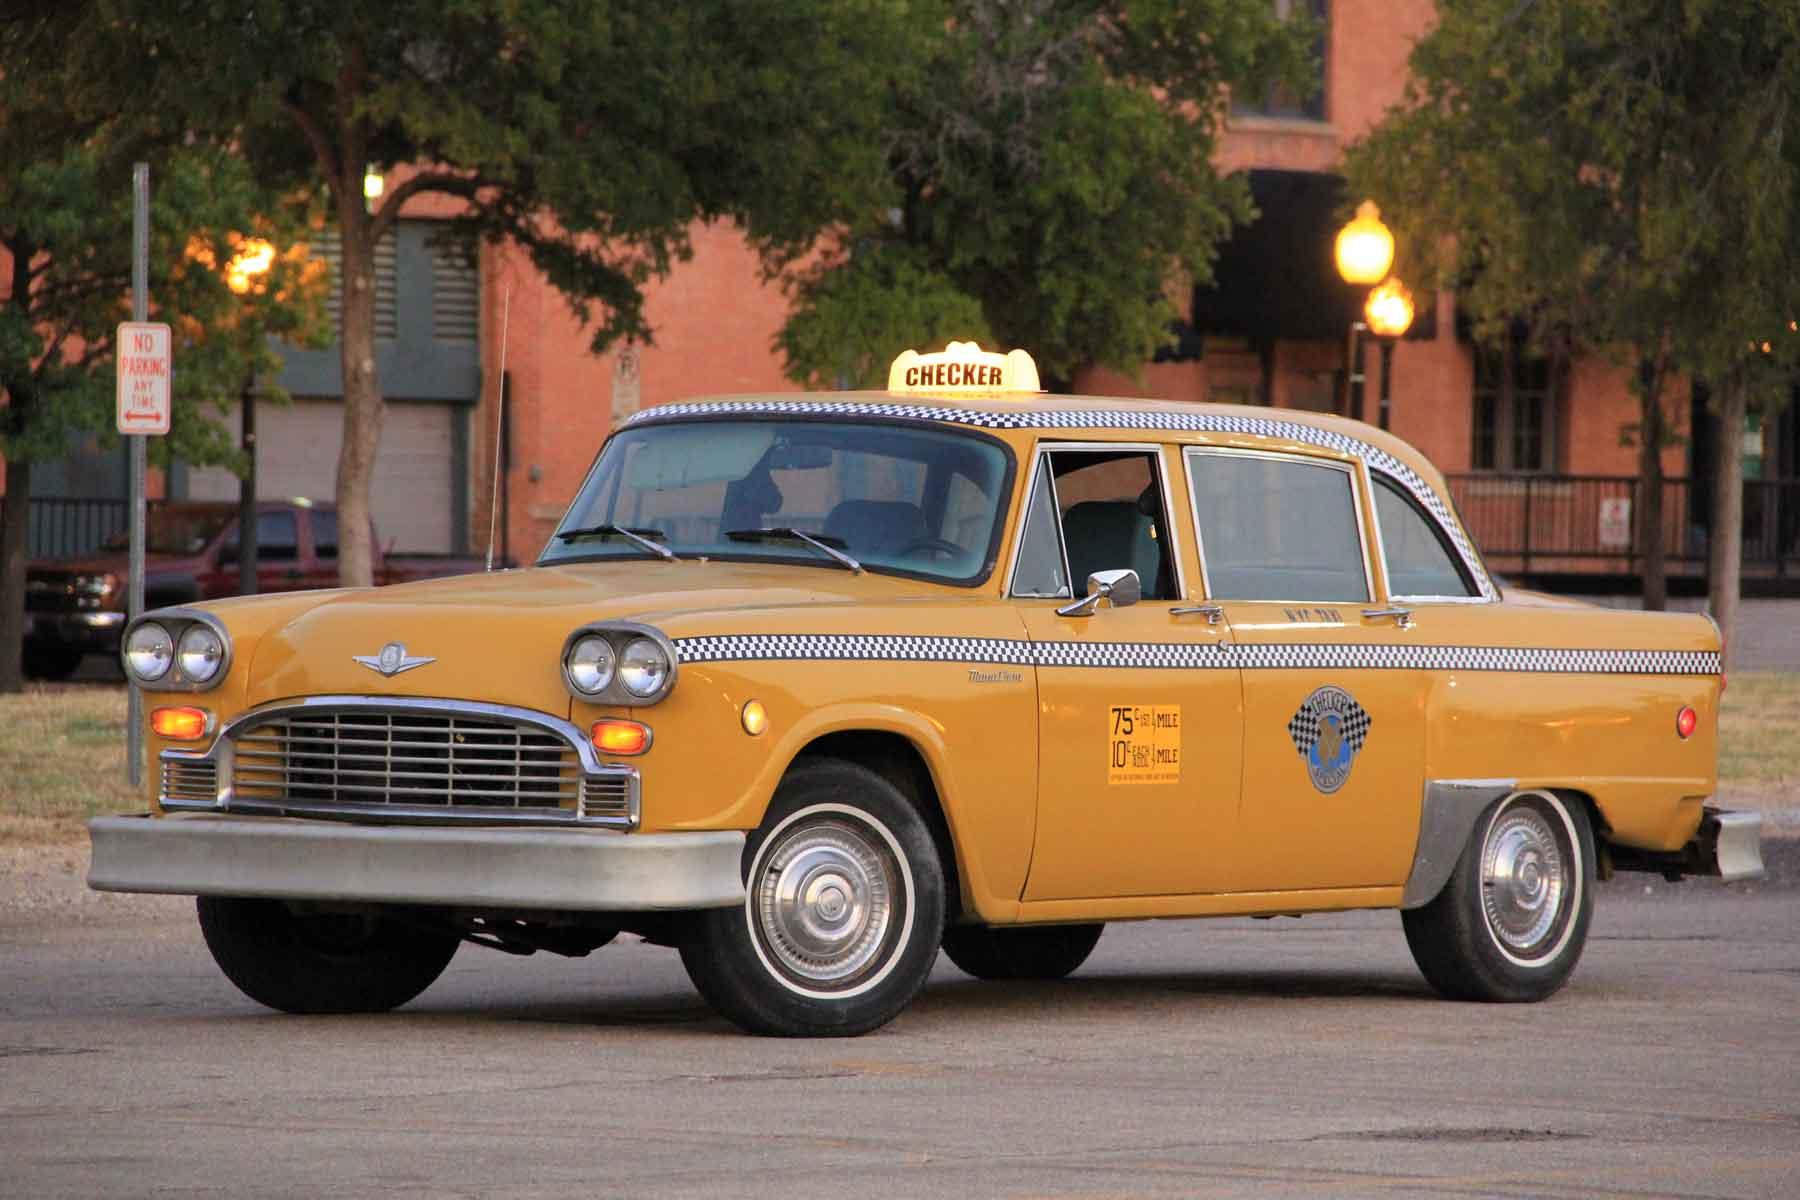 Checker Marathon America S Classic New York Taxi Cab